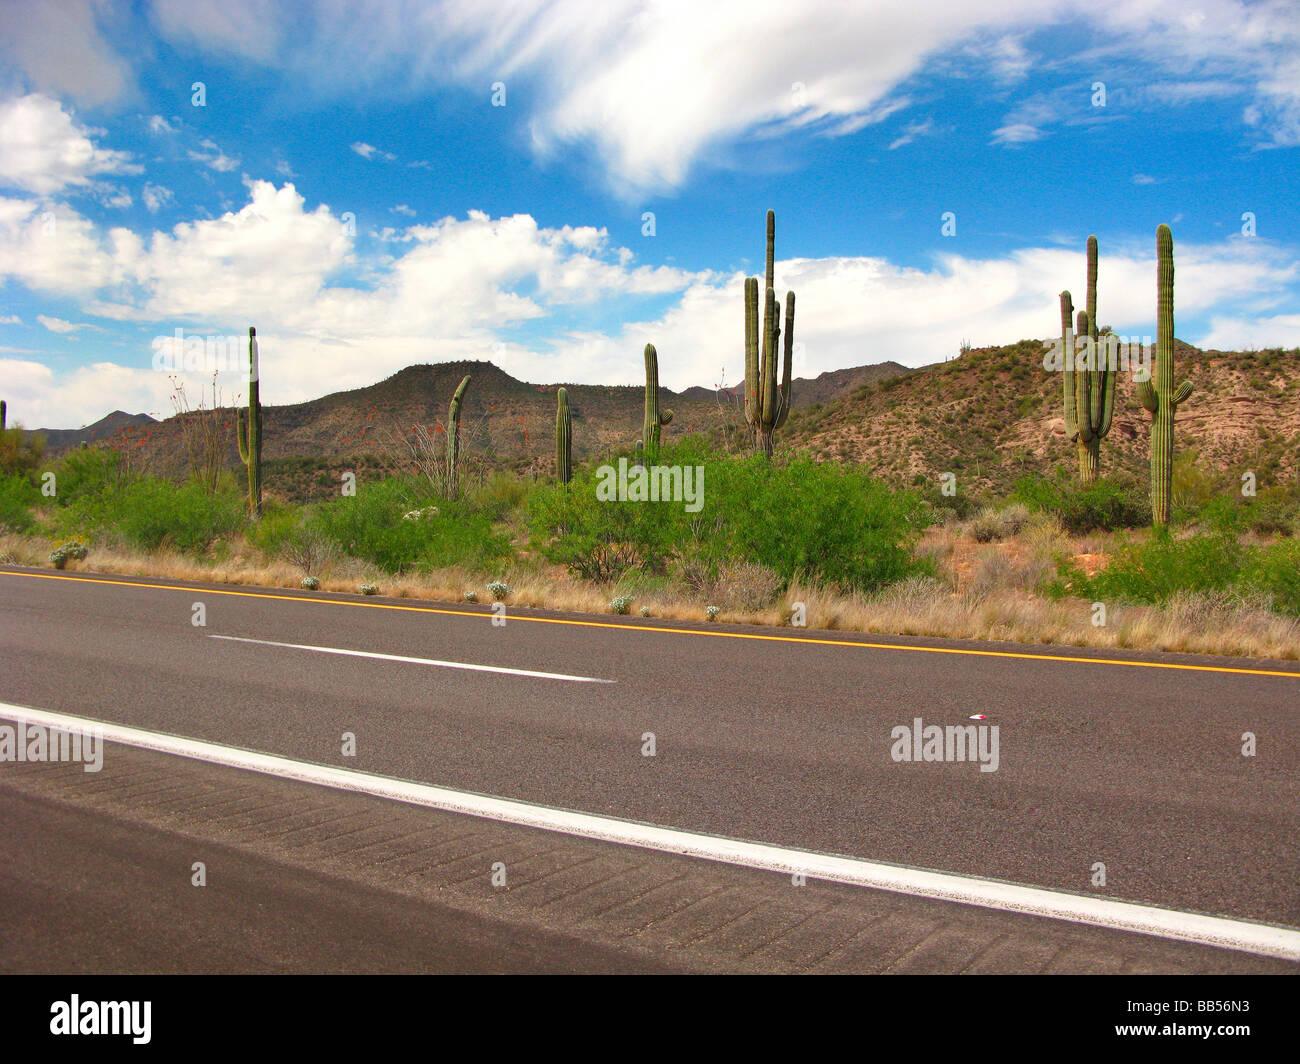 Desert road,empty,clean tarmac,blue skies - Stock Image